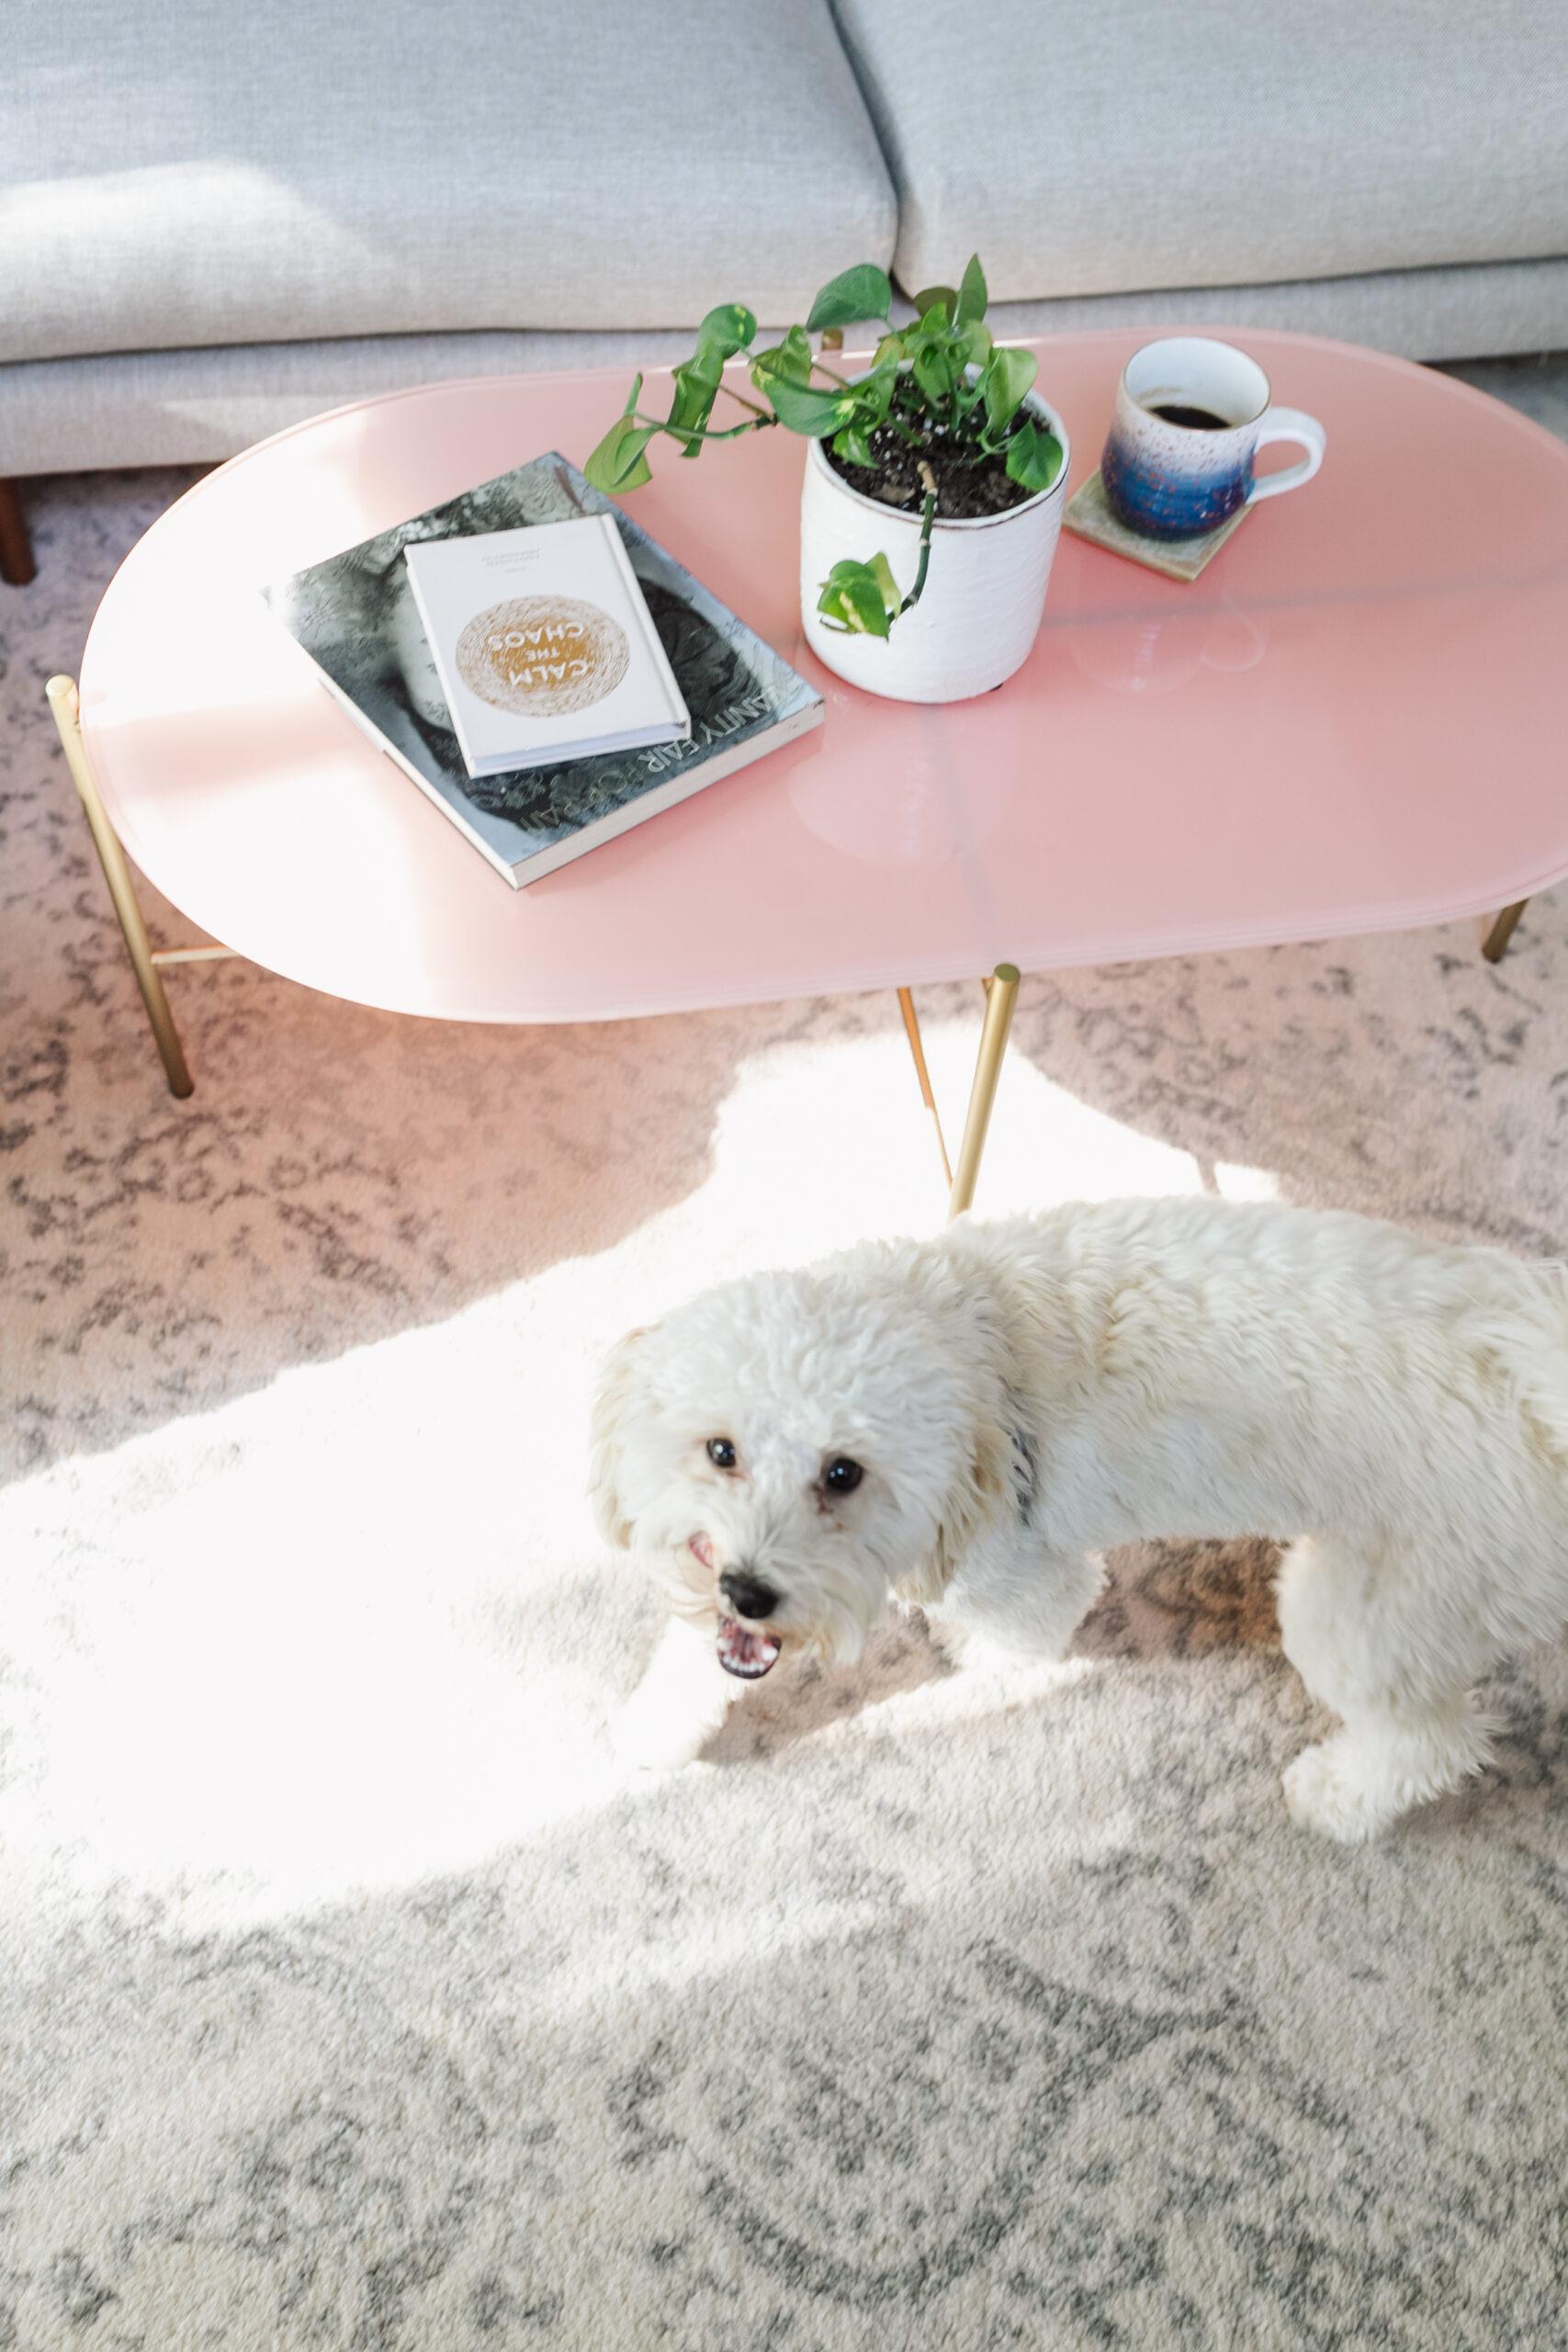 cute pup not included ;) #modernmountainlivingroom #labradoodle #cofffeetable